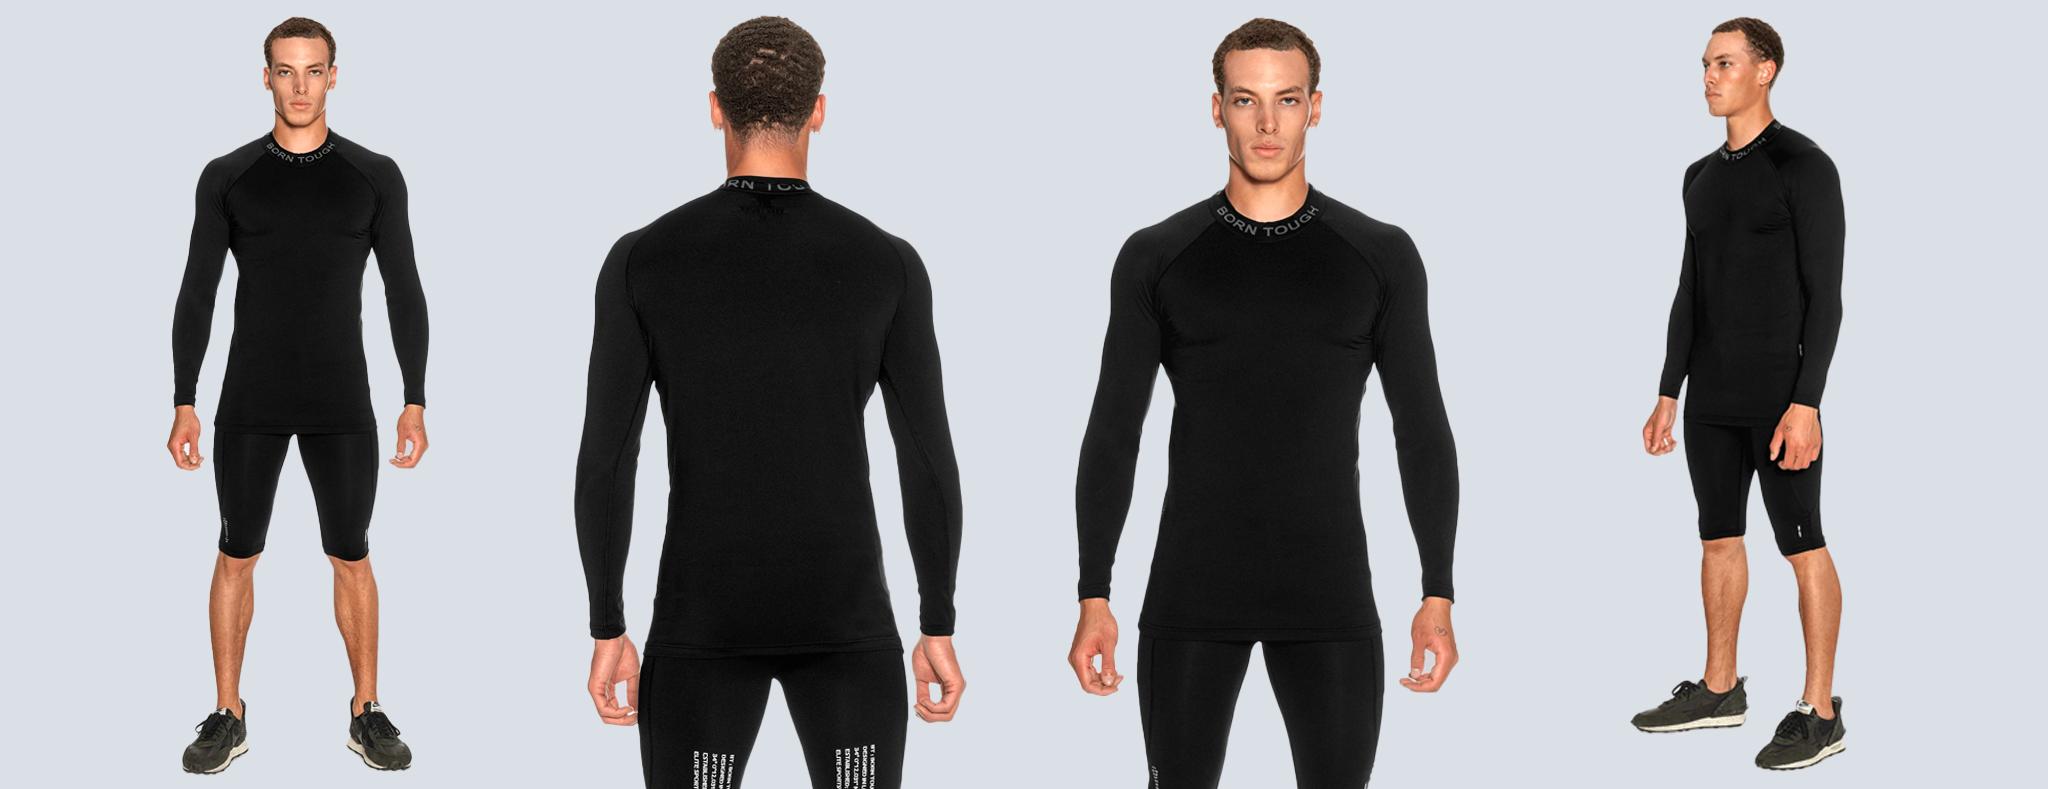 Long Sleeve Shirt Compression